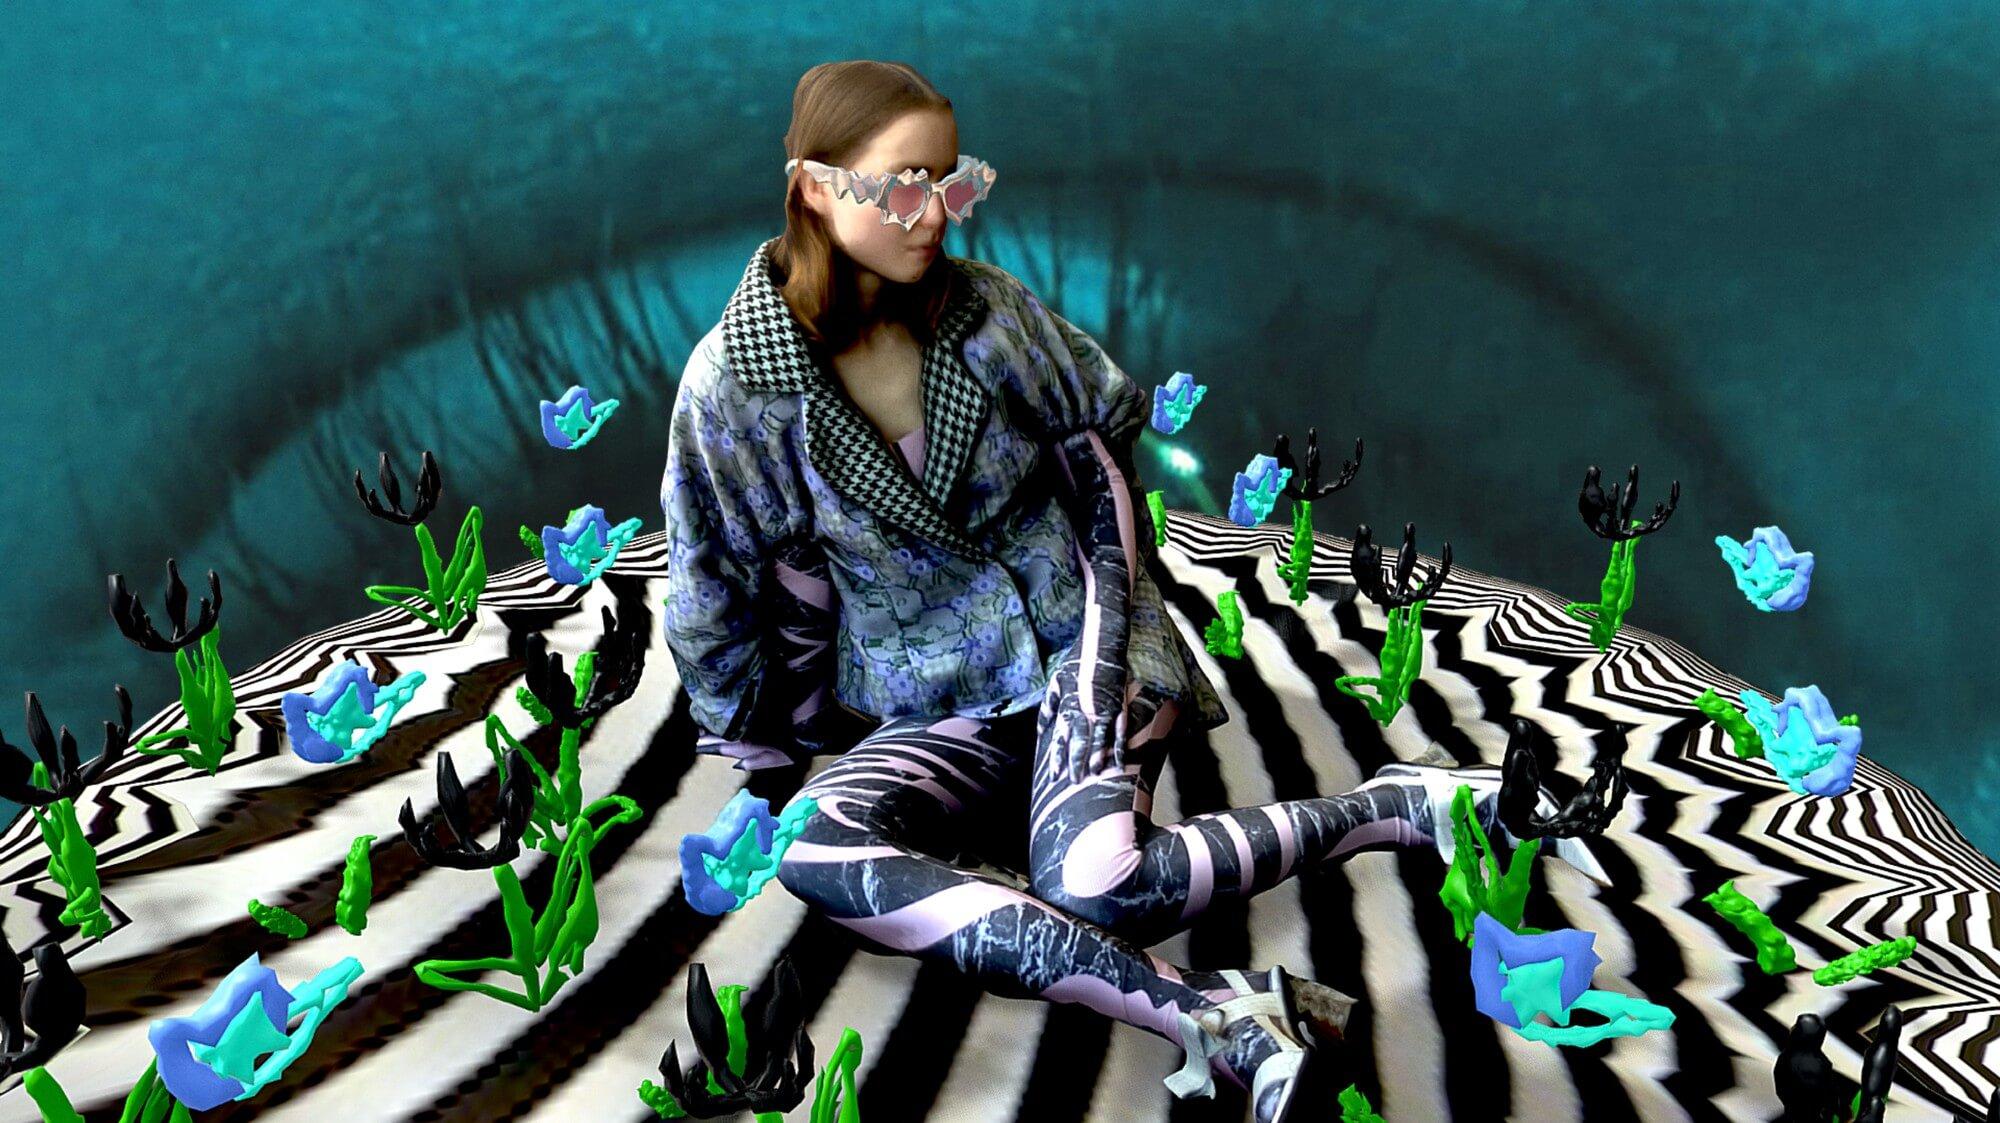 3D排版和動畫對時裝學生而言,已經是「手版眼見功夫」。